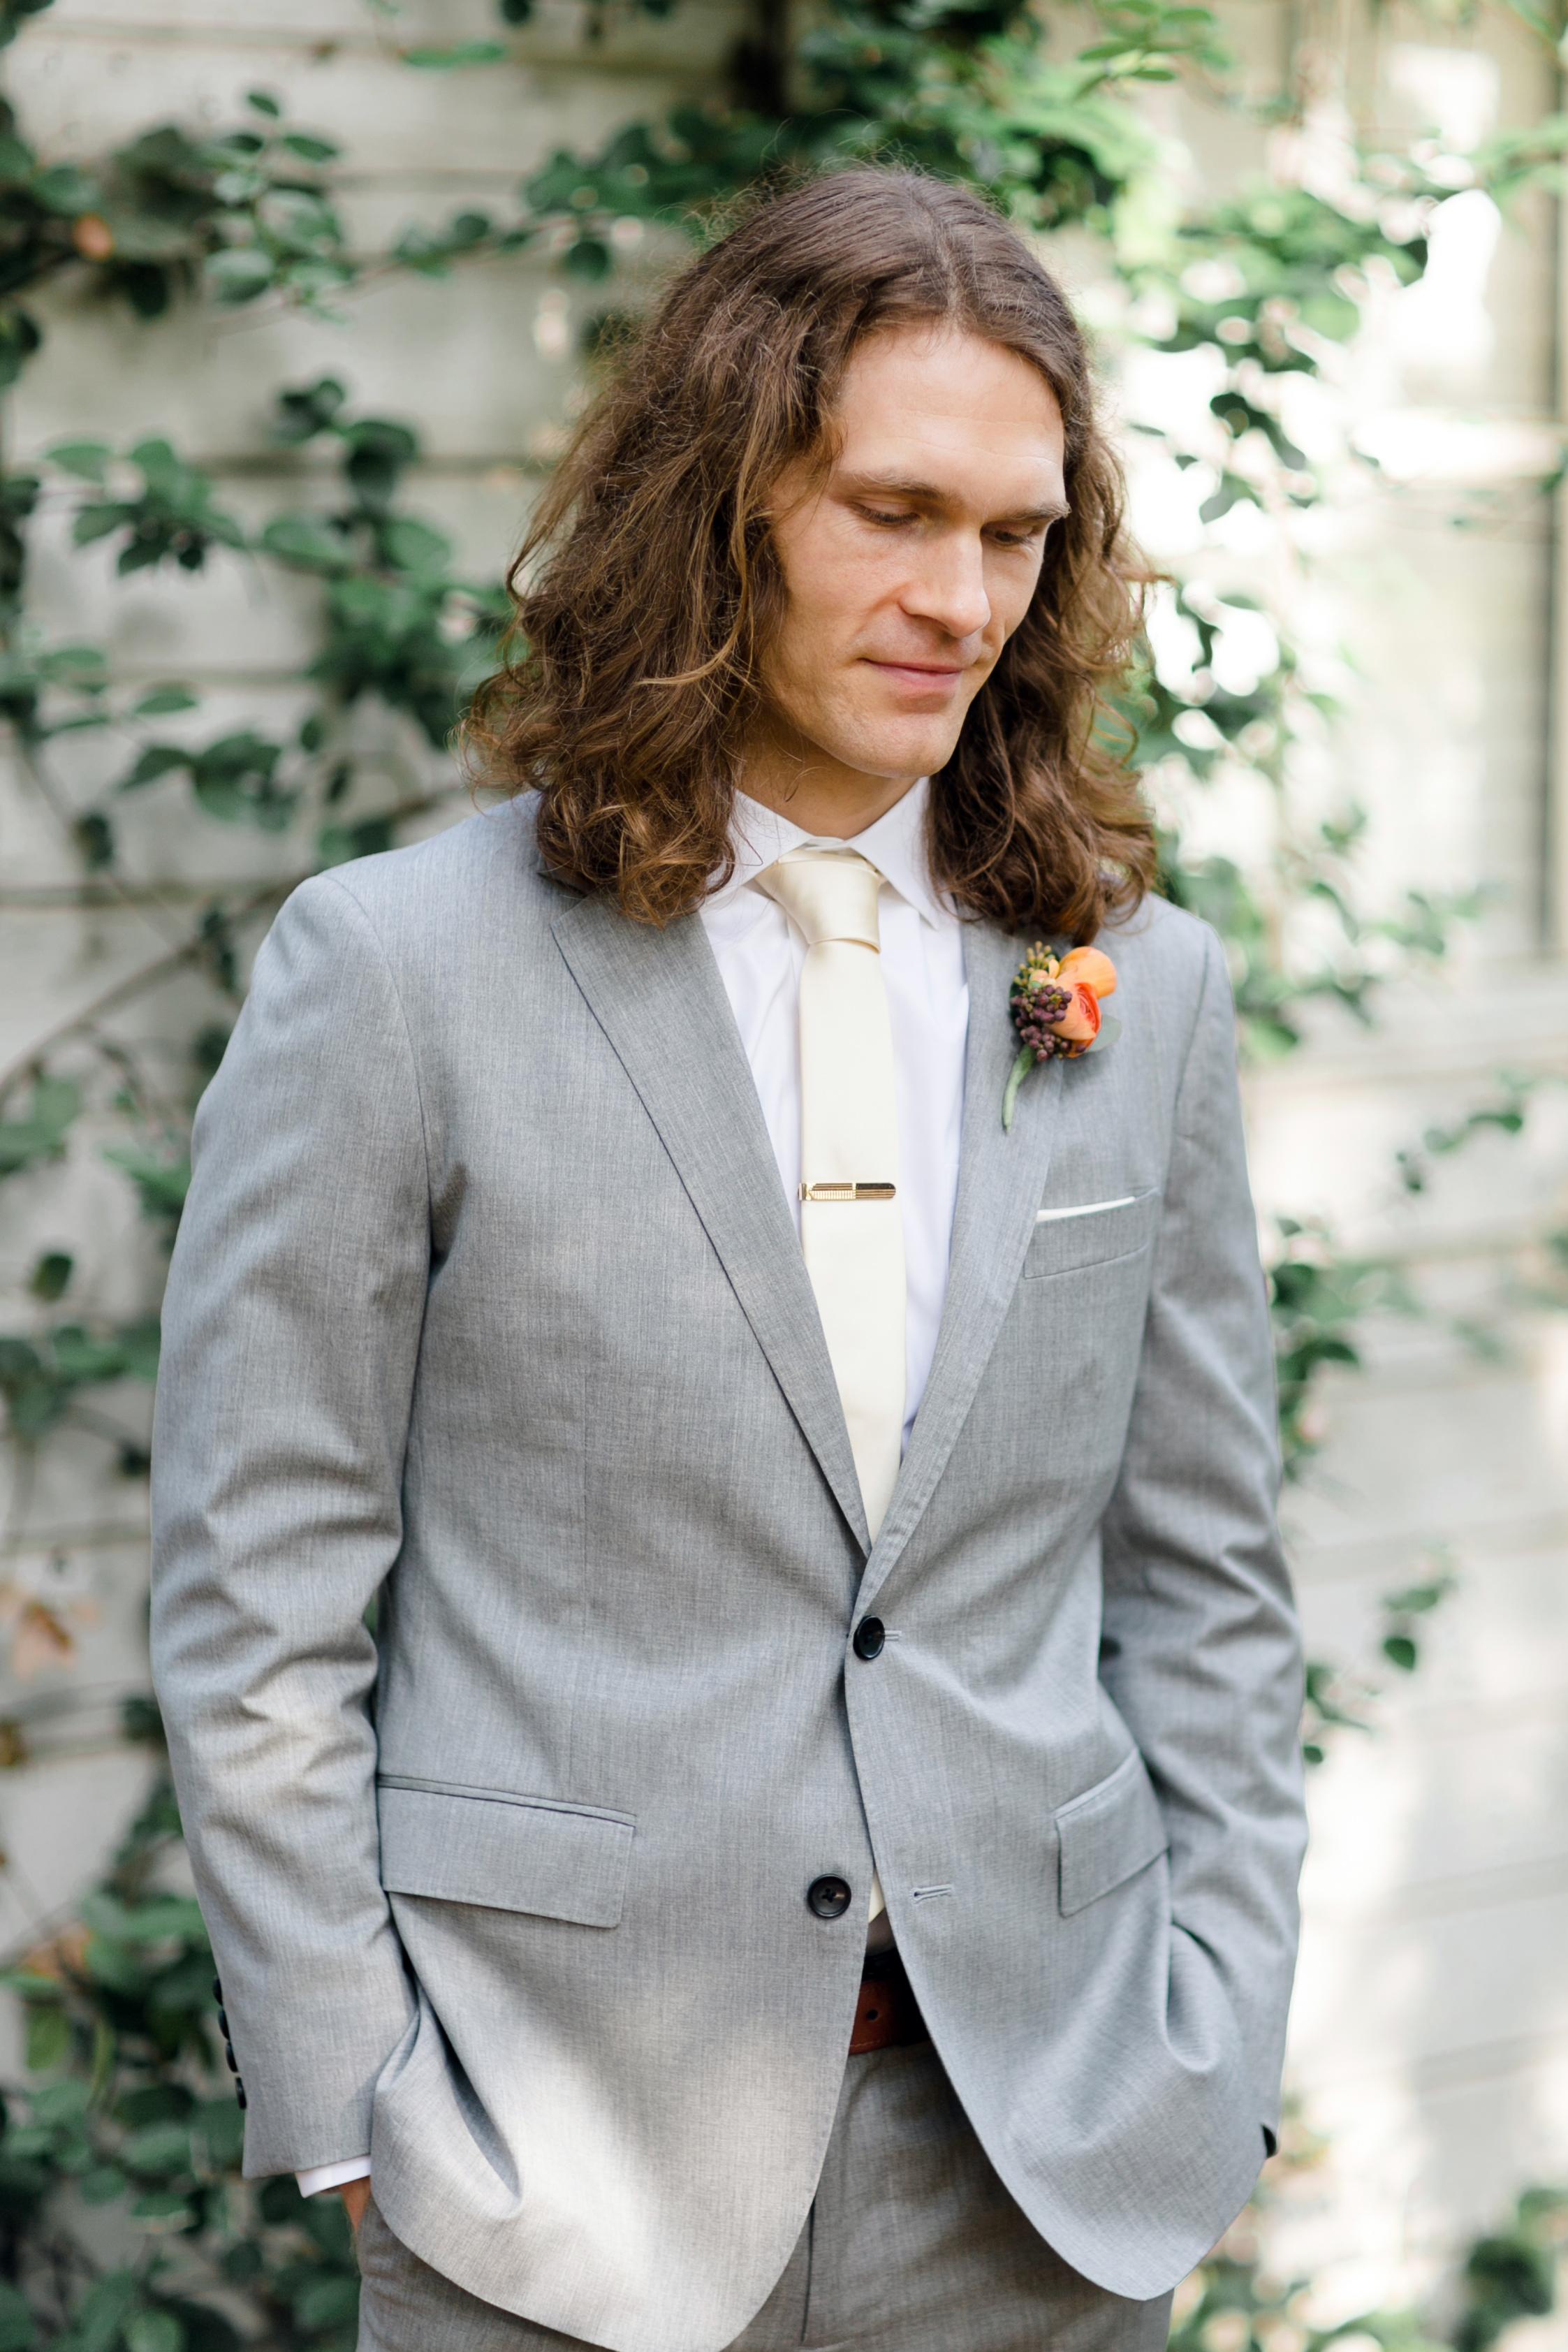 Austin Fine Art Wedding Photographer Kayla Snell Photography - Mercury Hall Brunch Wedding Austin